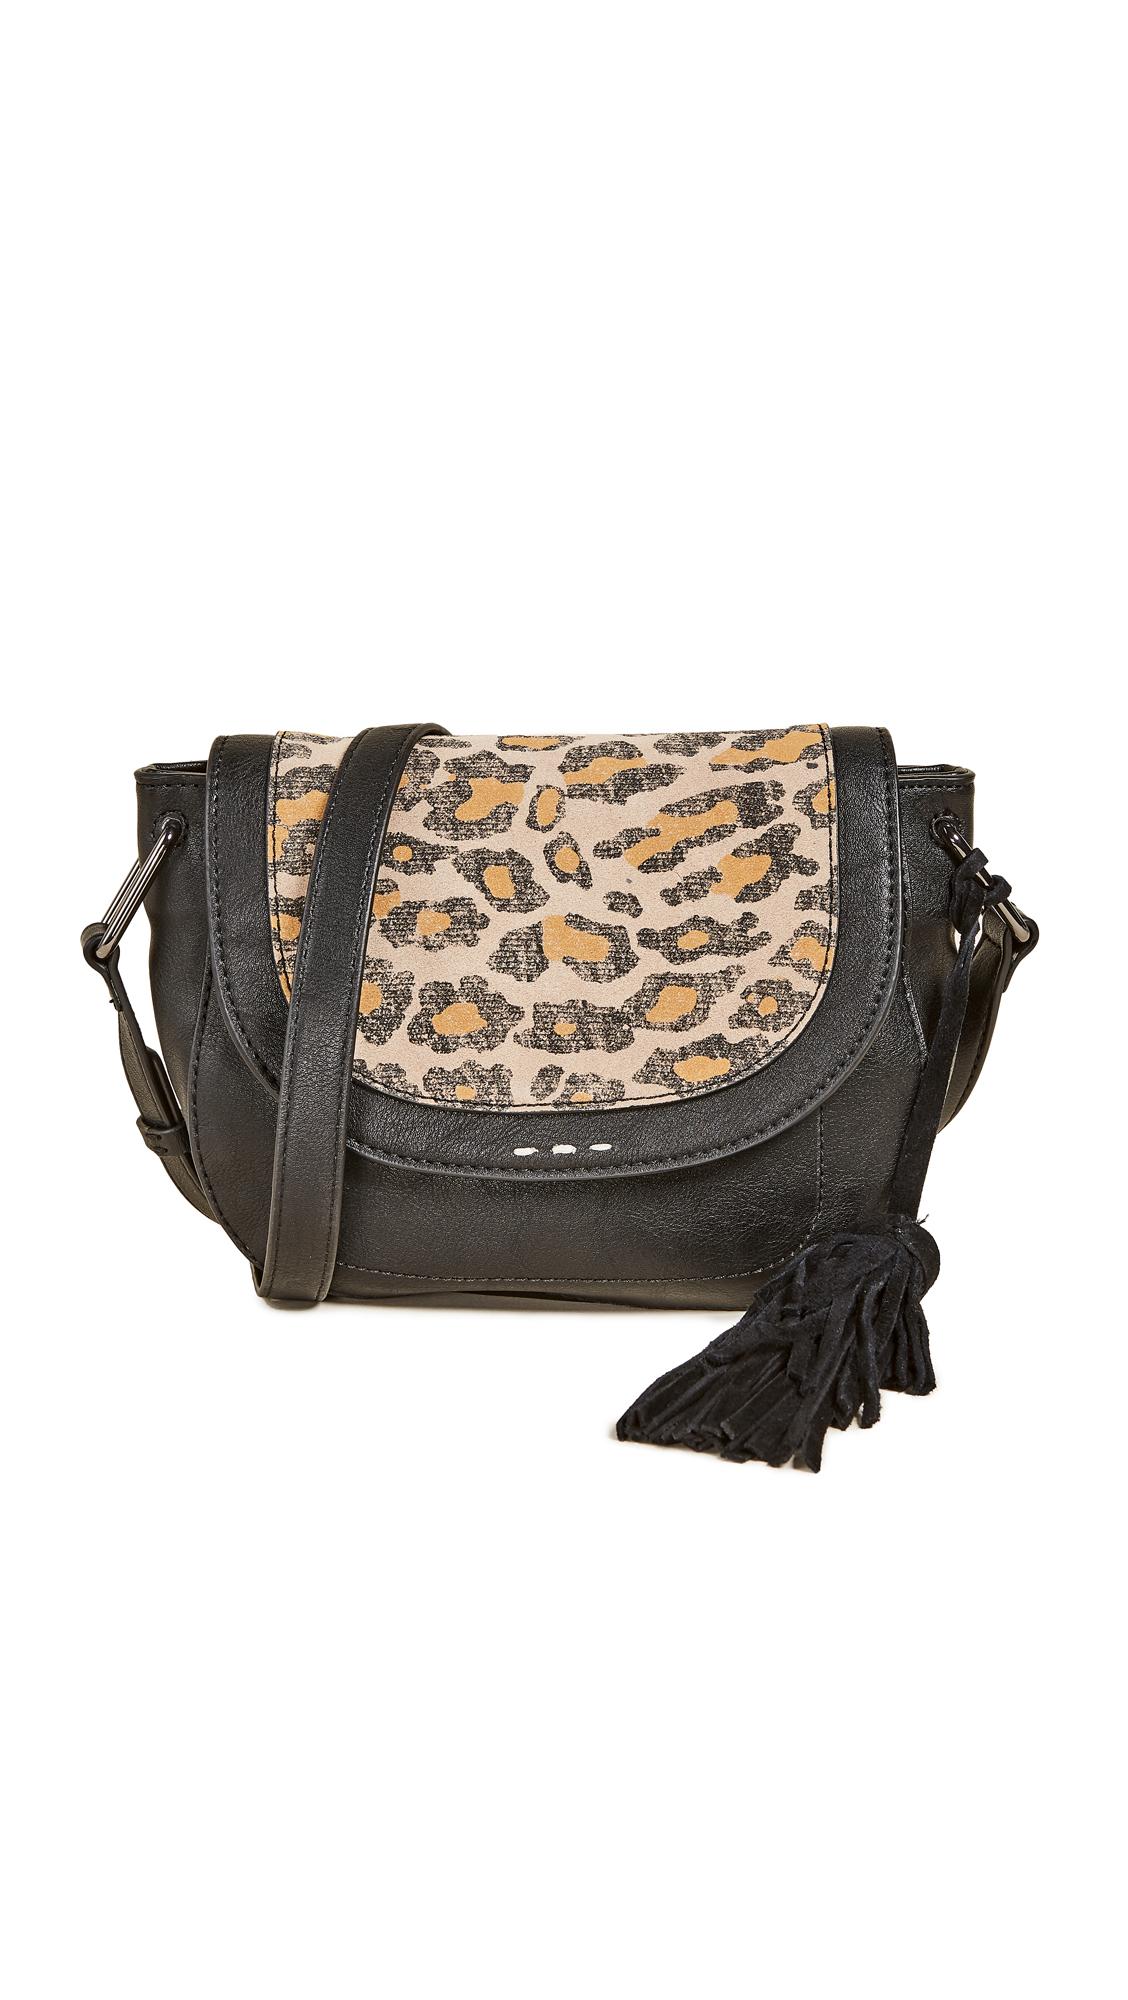 Splendid Key Largo Cross Body Bag - Leopard